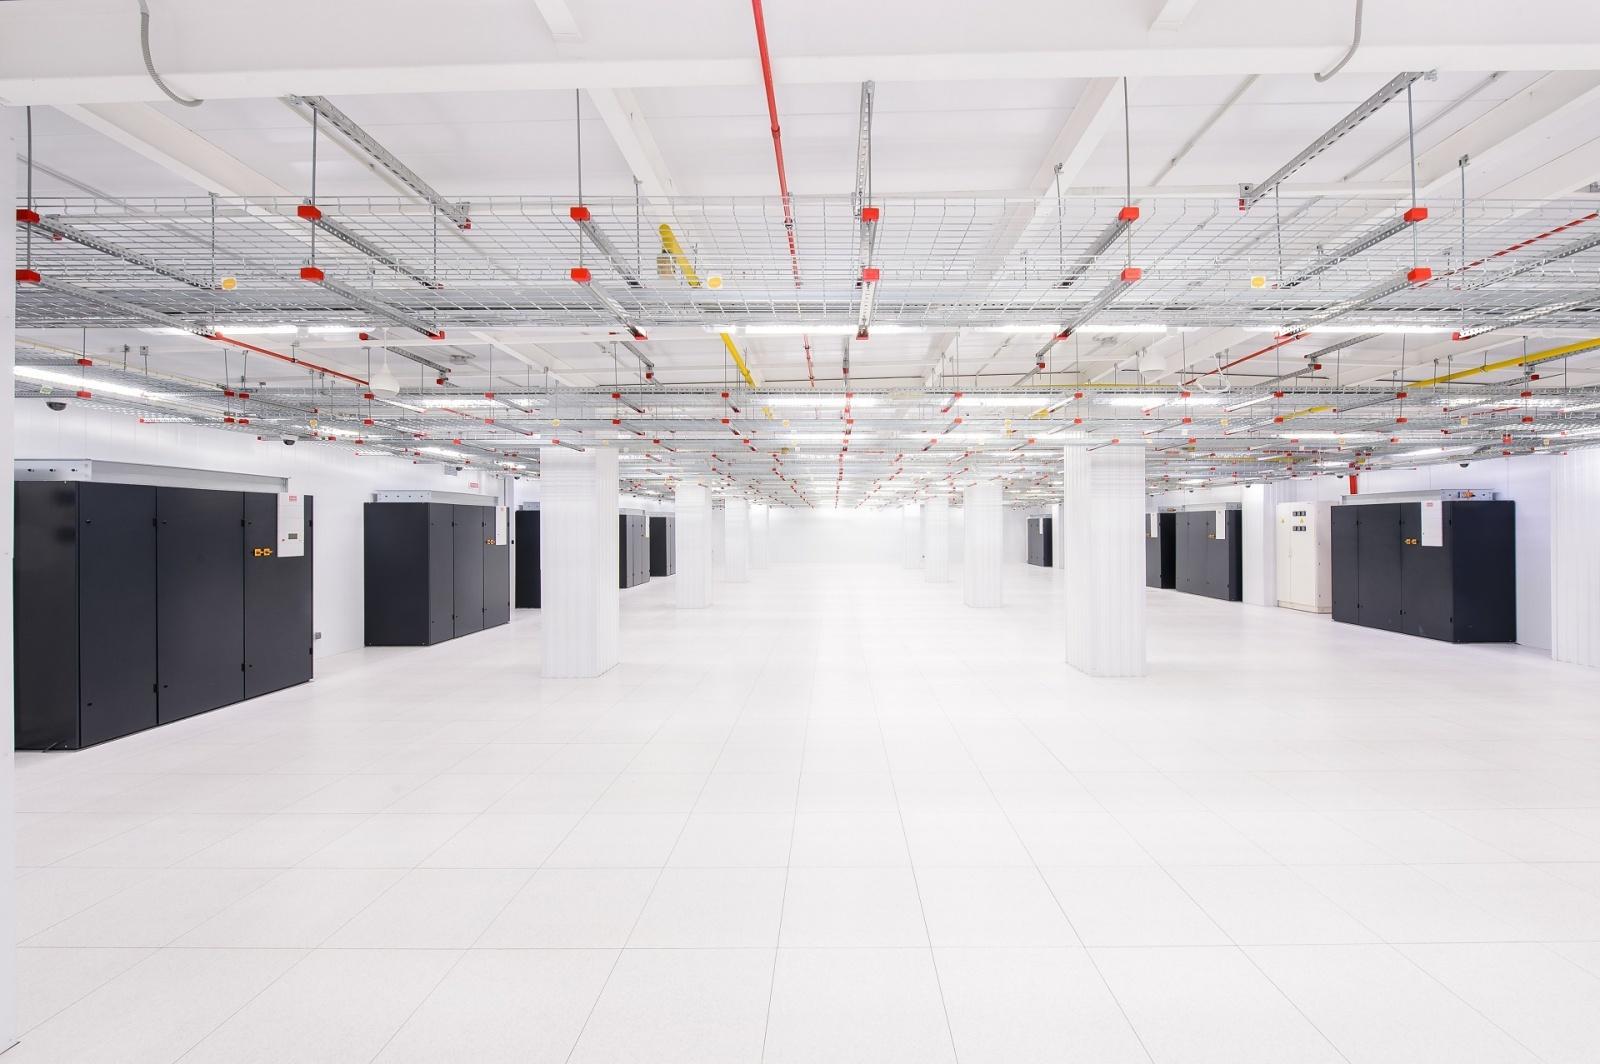 Как создавалась система холодоснабжения дата-центра NORD-4 - 9